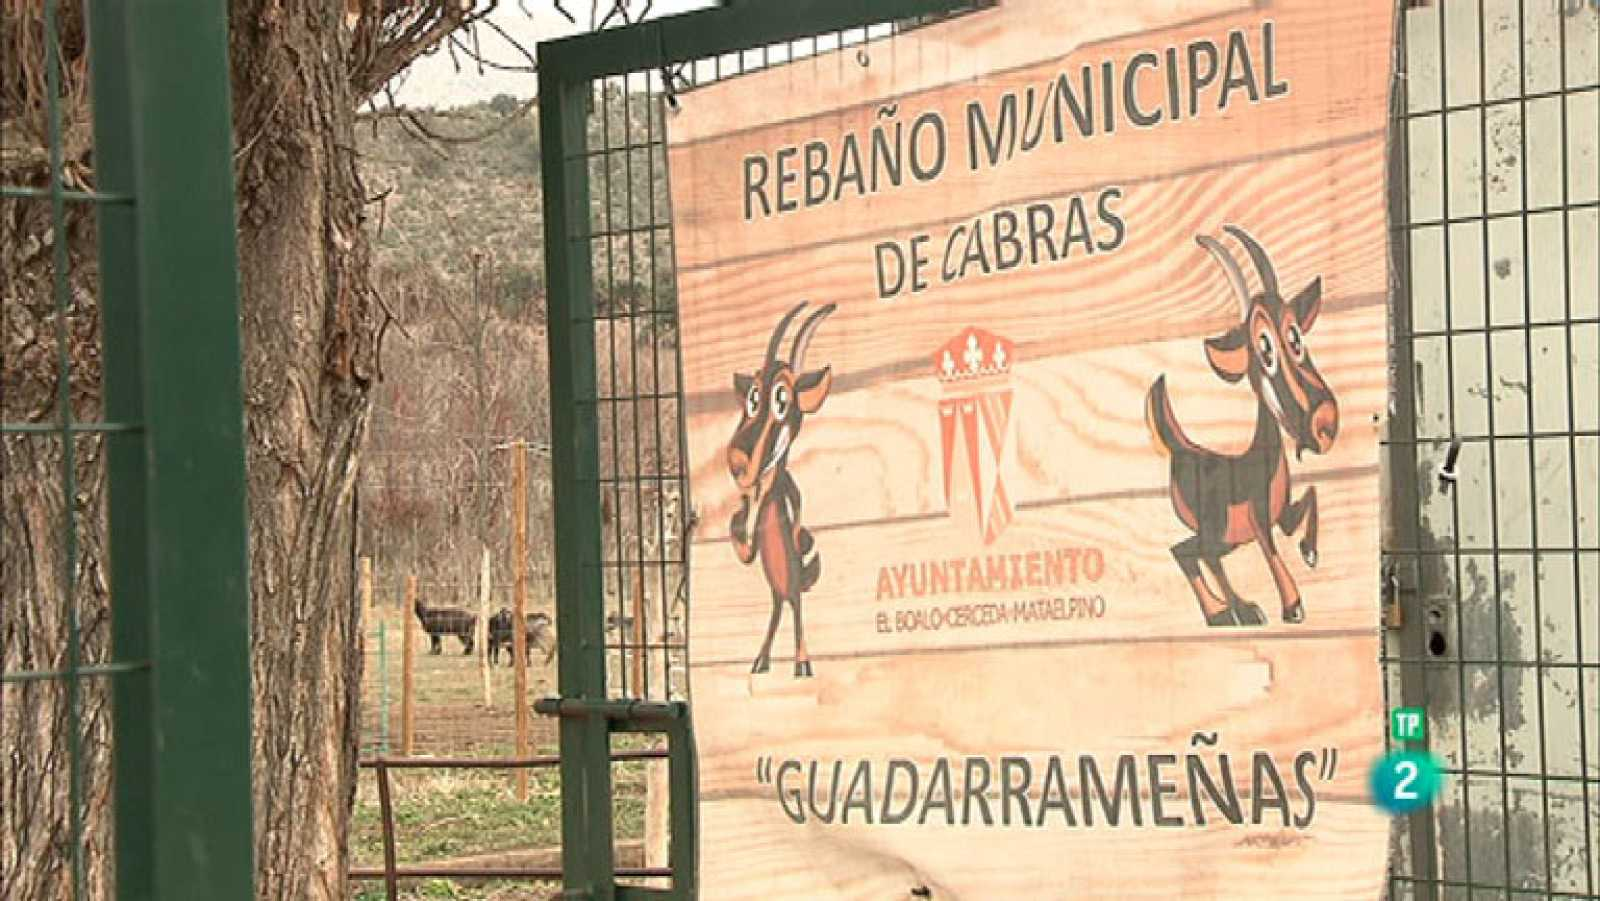 La Aventura del Saber. TVE. El Boalo-Cerceda-Mataelpino